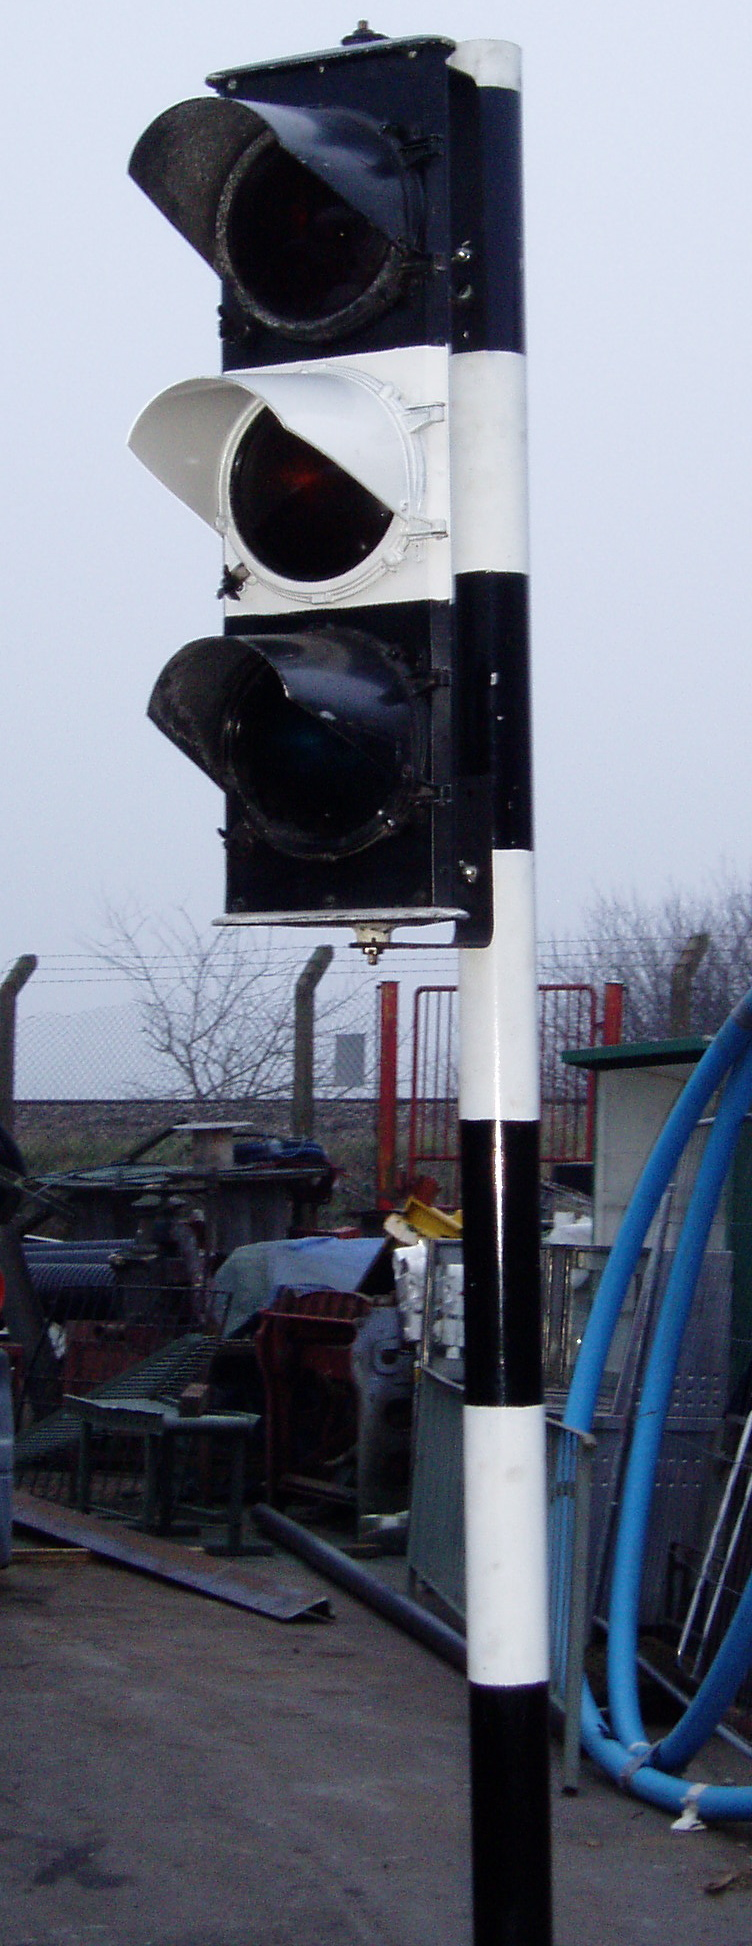 Traffic Light Period - PC060192